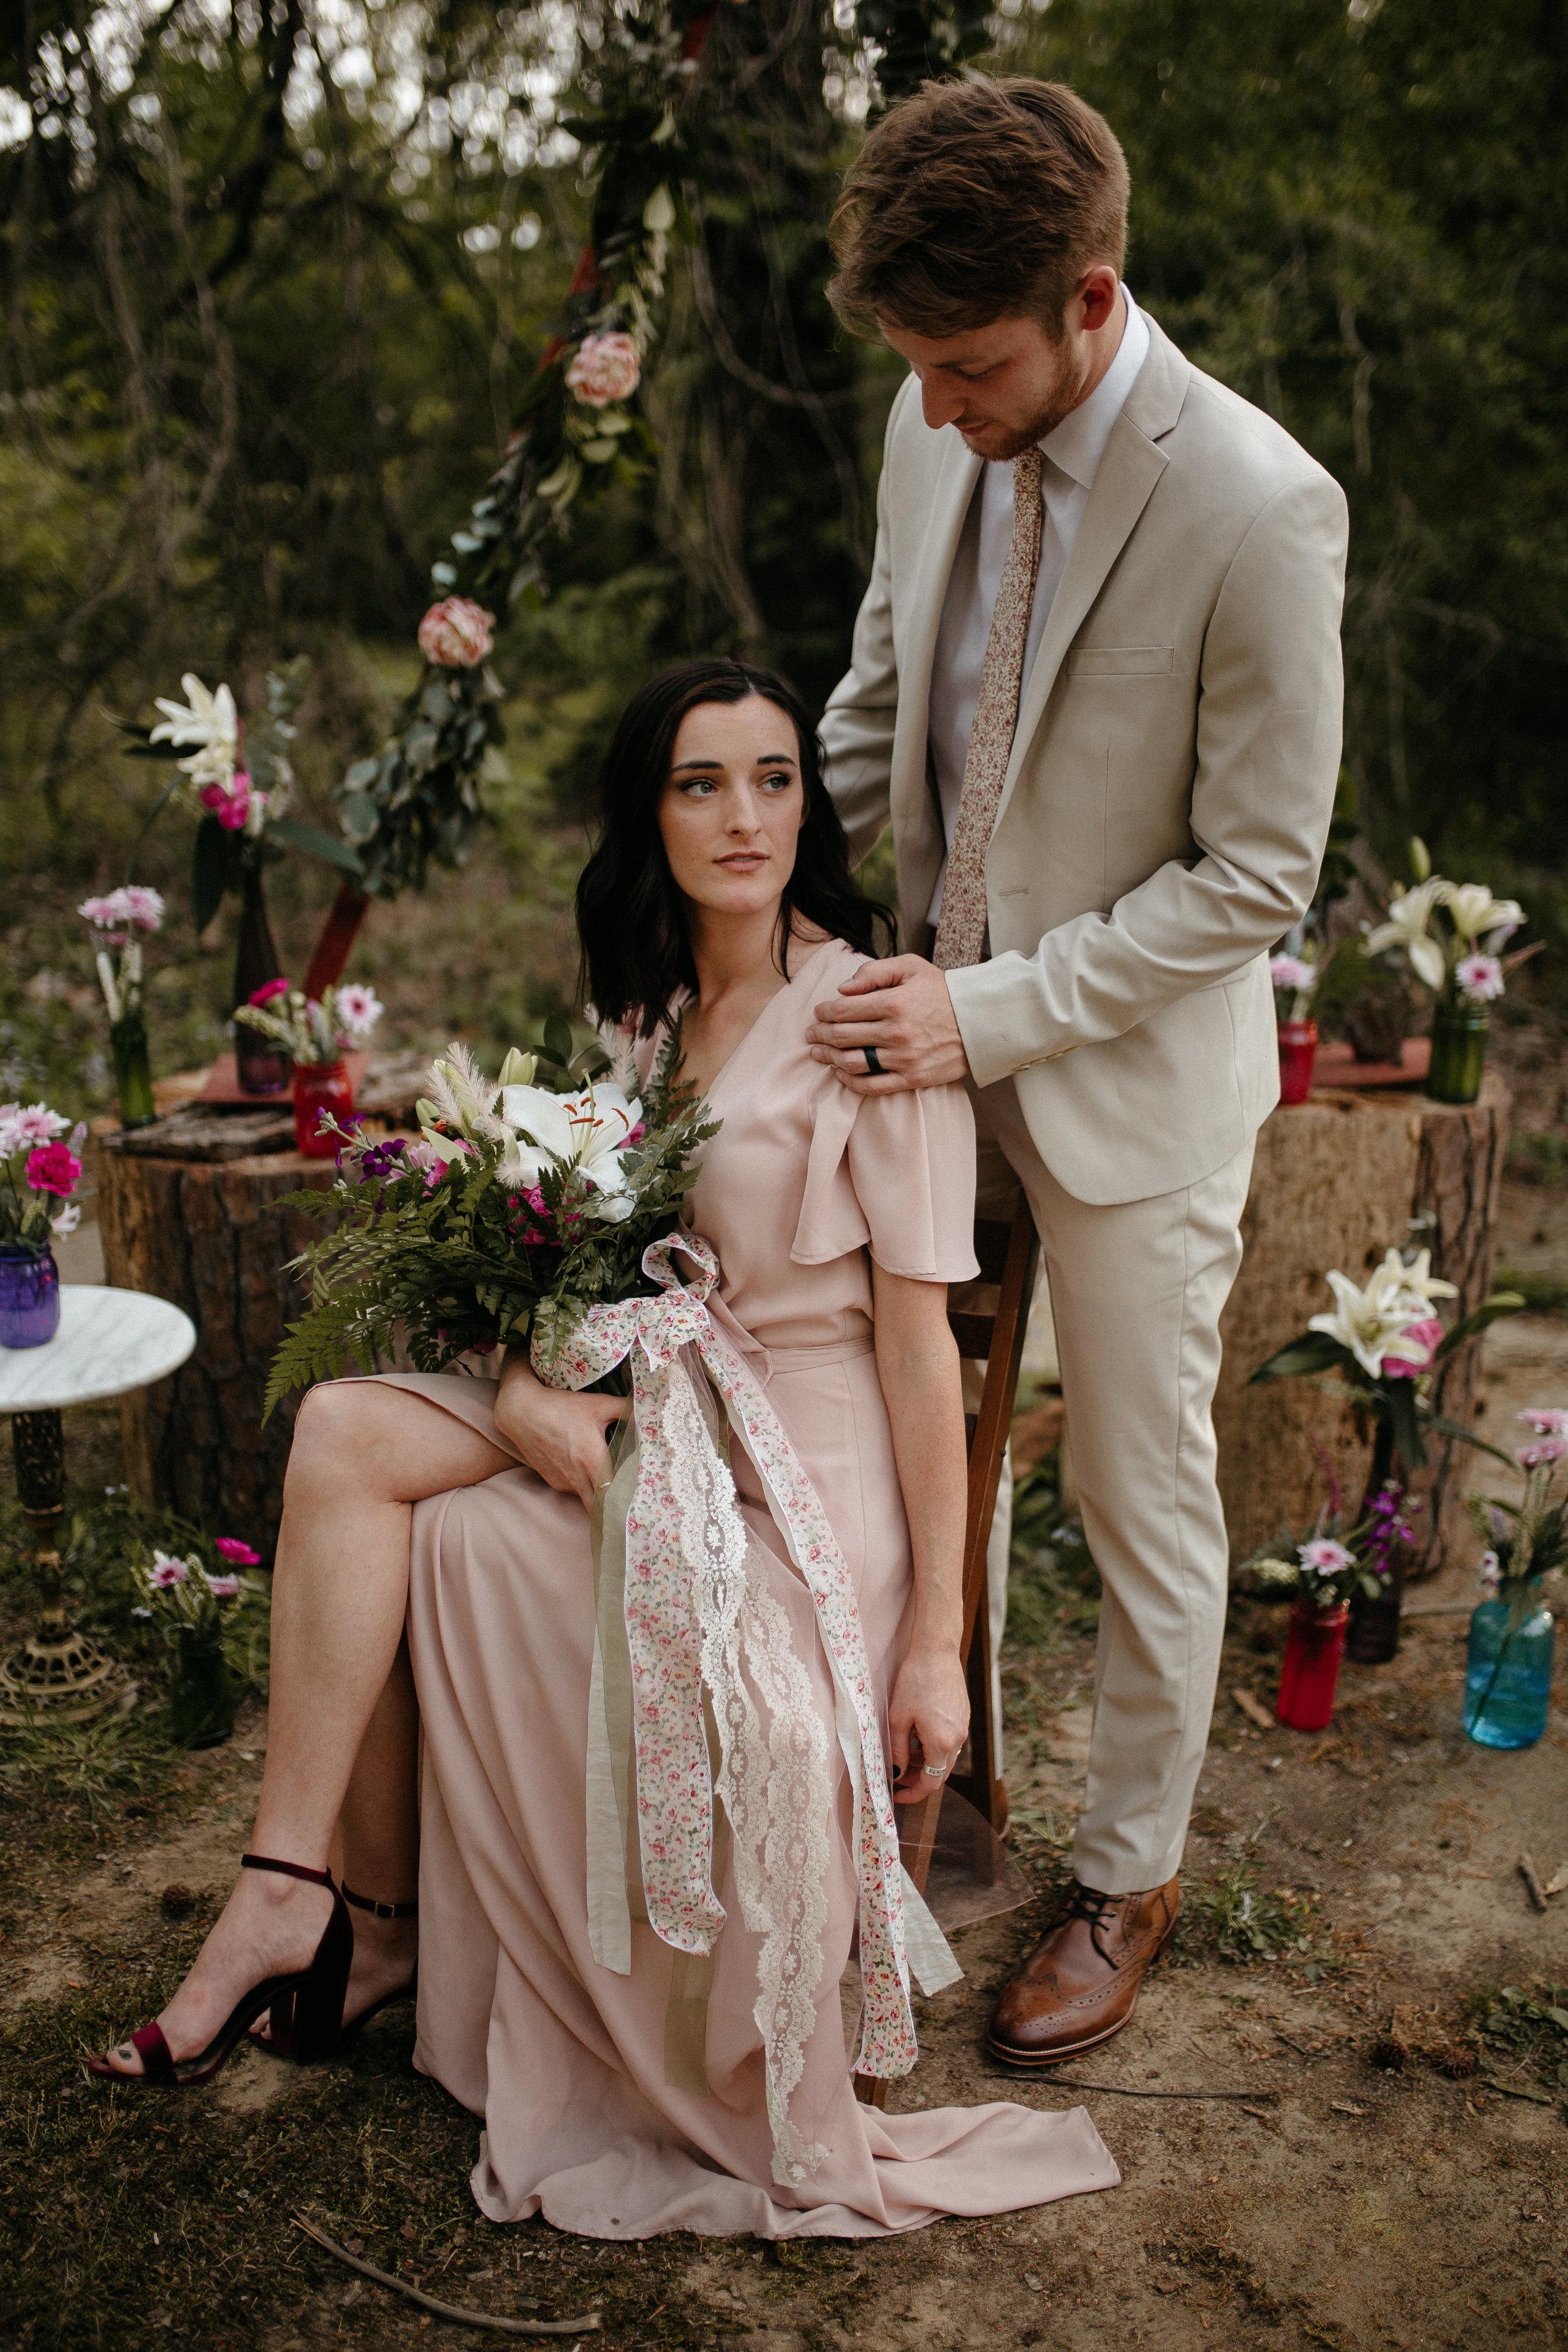 memphis-tennessee-wedding-photographer-the-hatches-utah-colorado-washington-arizona-oregon-yosemite-national-park-elopement-adventure-emotional-journalistic-spring-florals-colorful